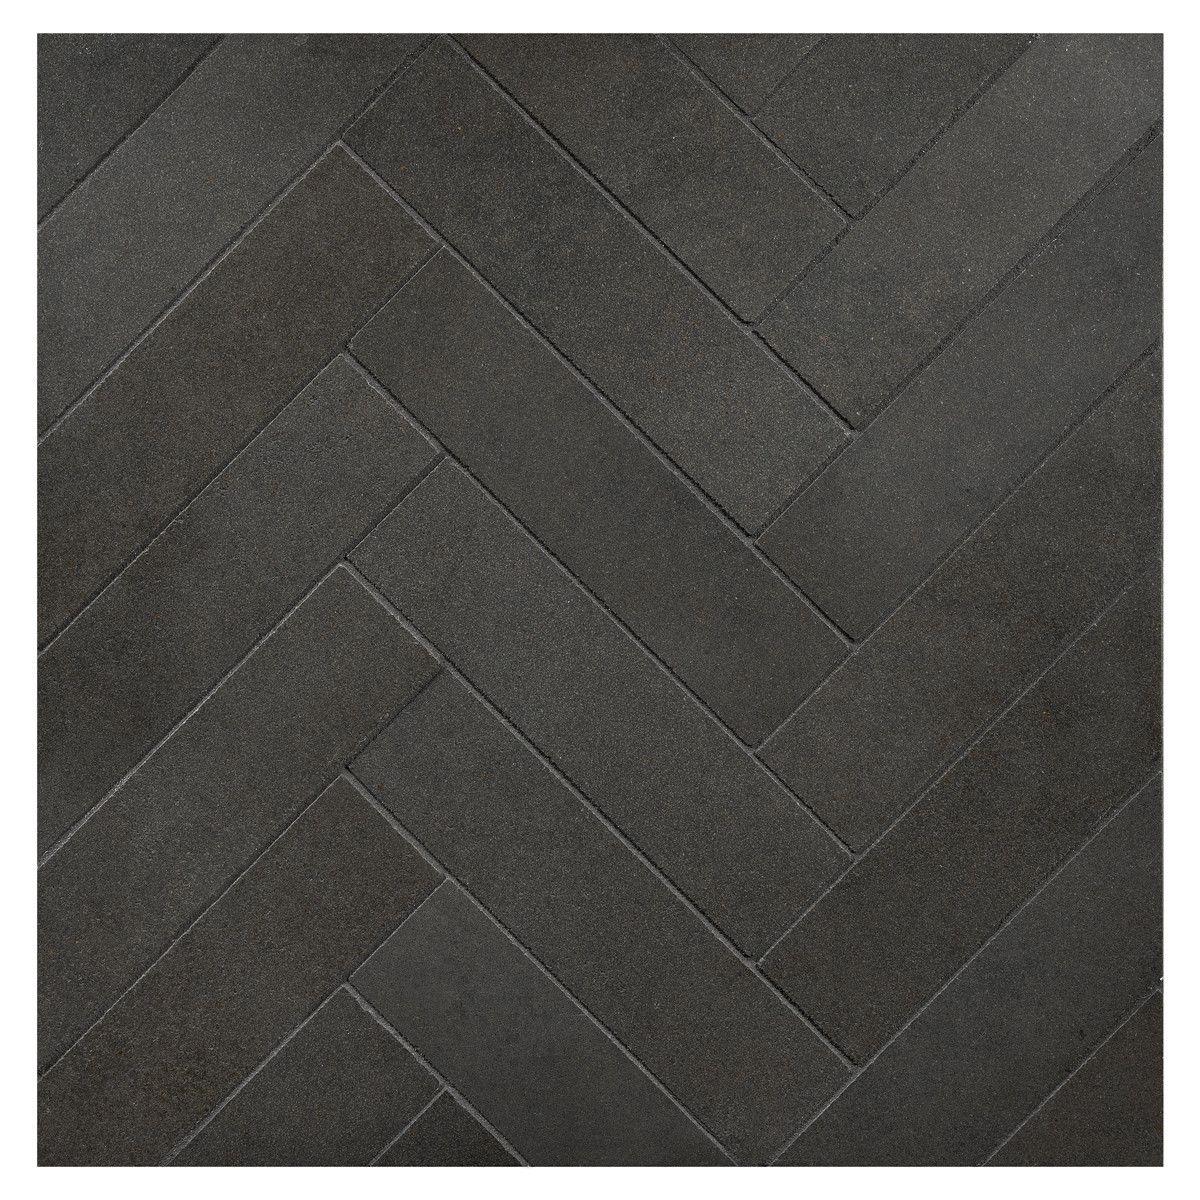 Deep Basalt Herringbone Harmony 1 1 2 X 6 Micro Joint Mosaic Black Mosaic Tile Basalt Black Floor Tiles